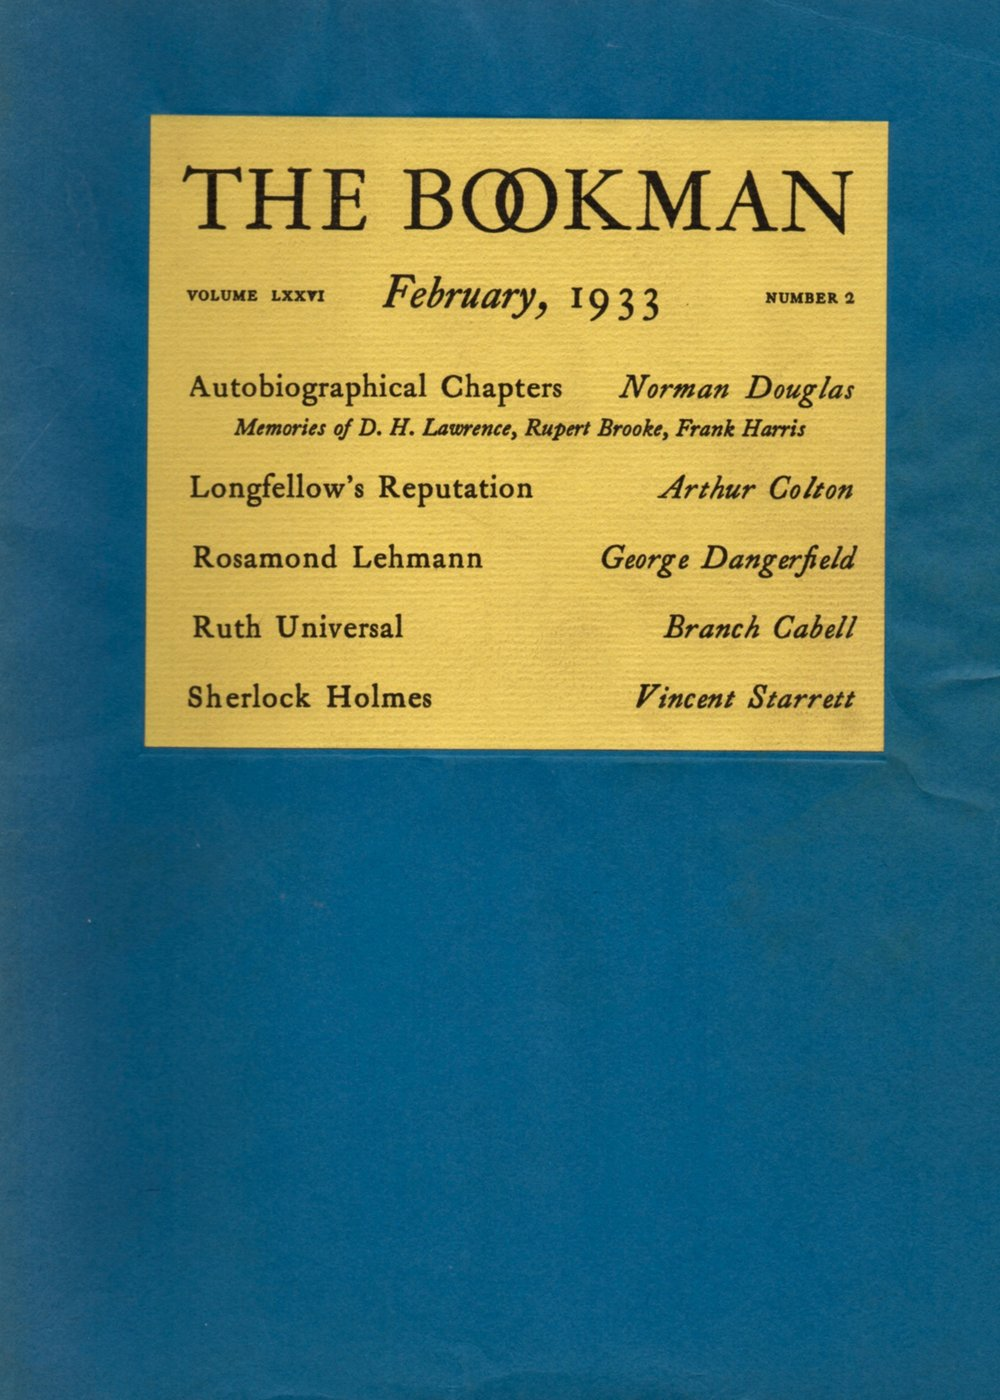 Bookman Feb 1933 cover.jpg